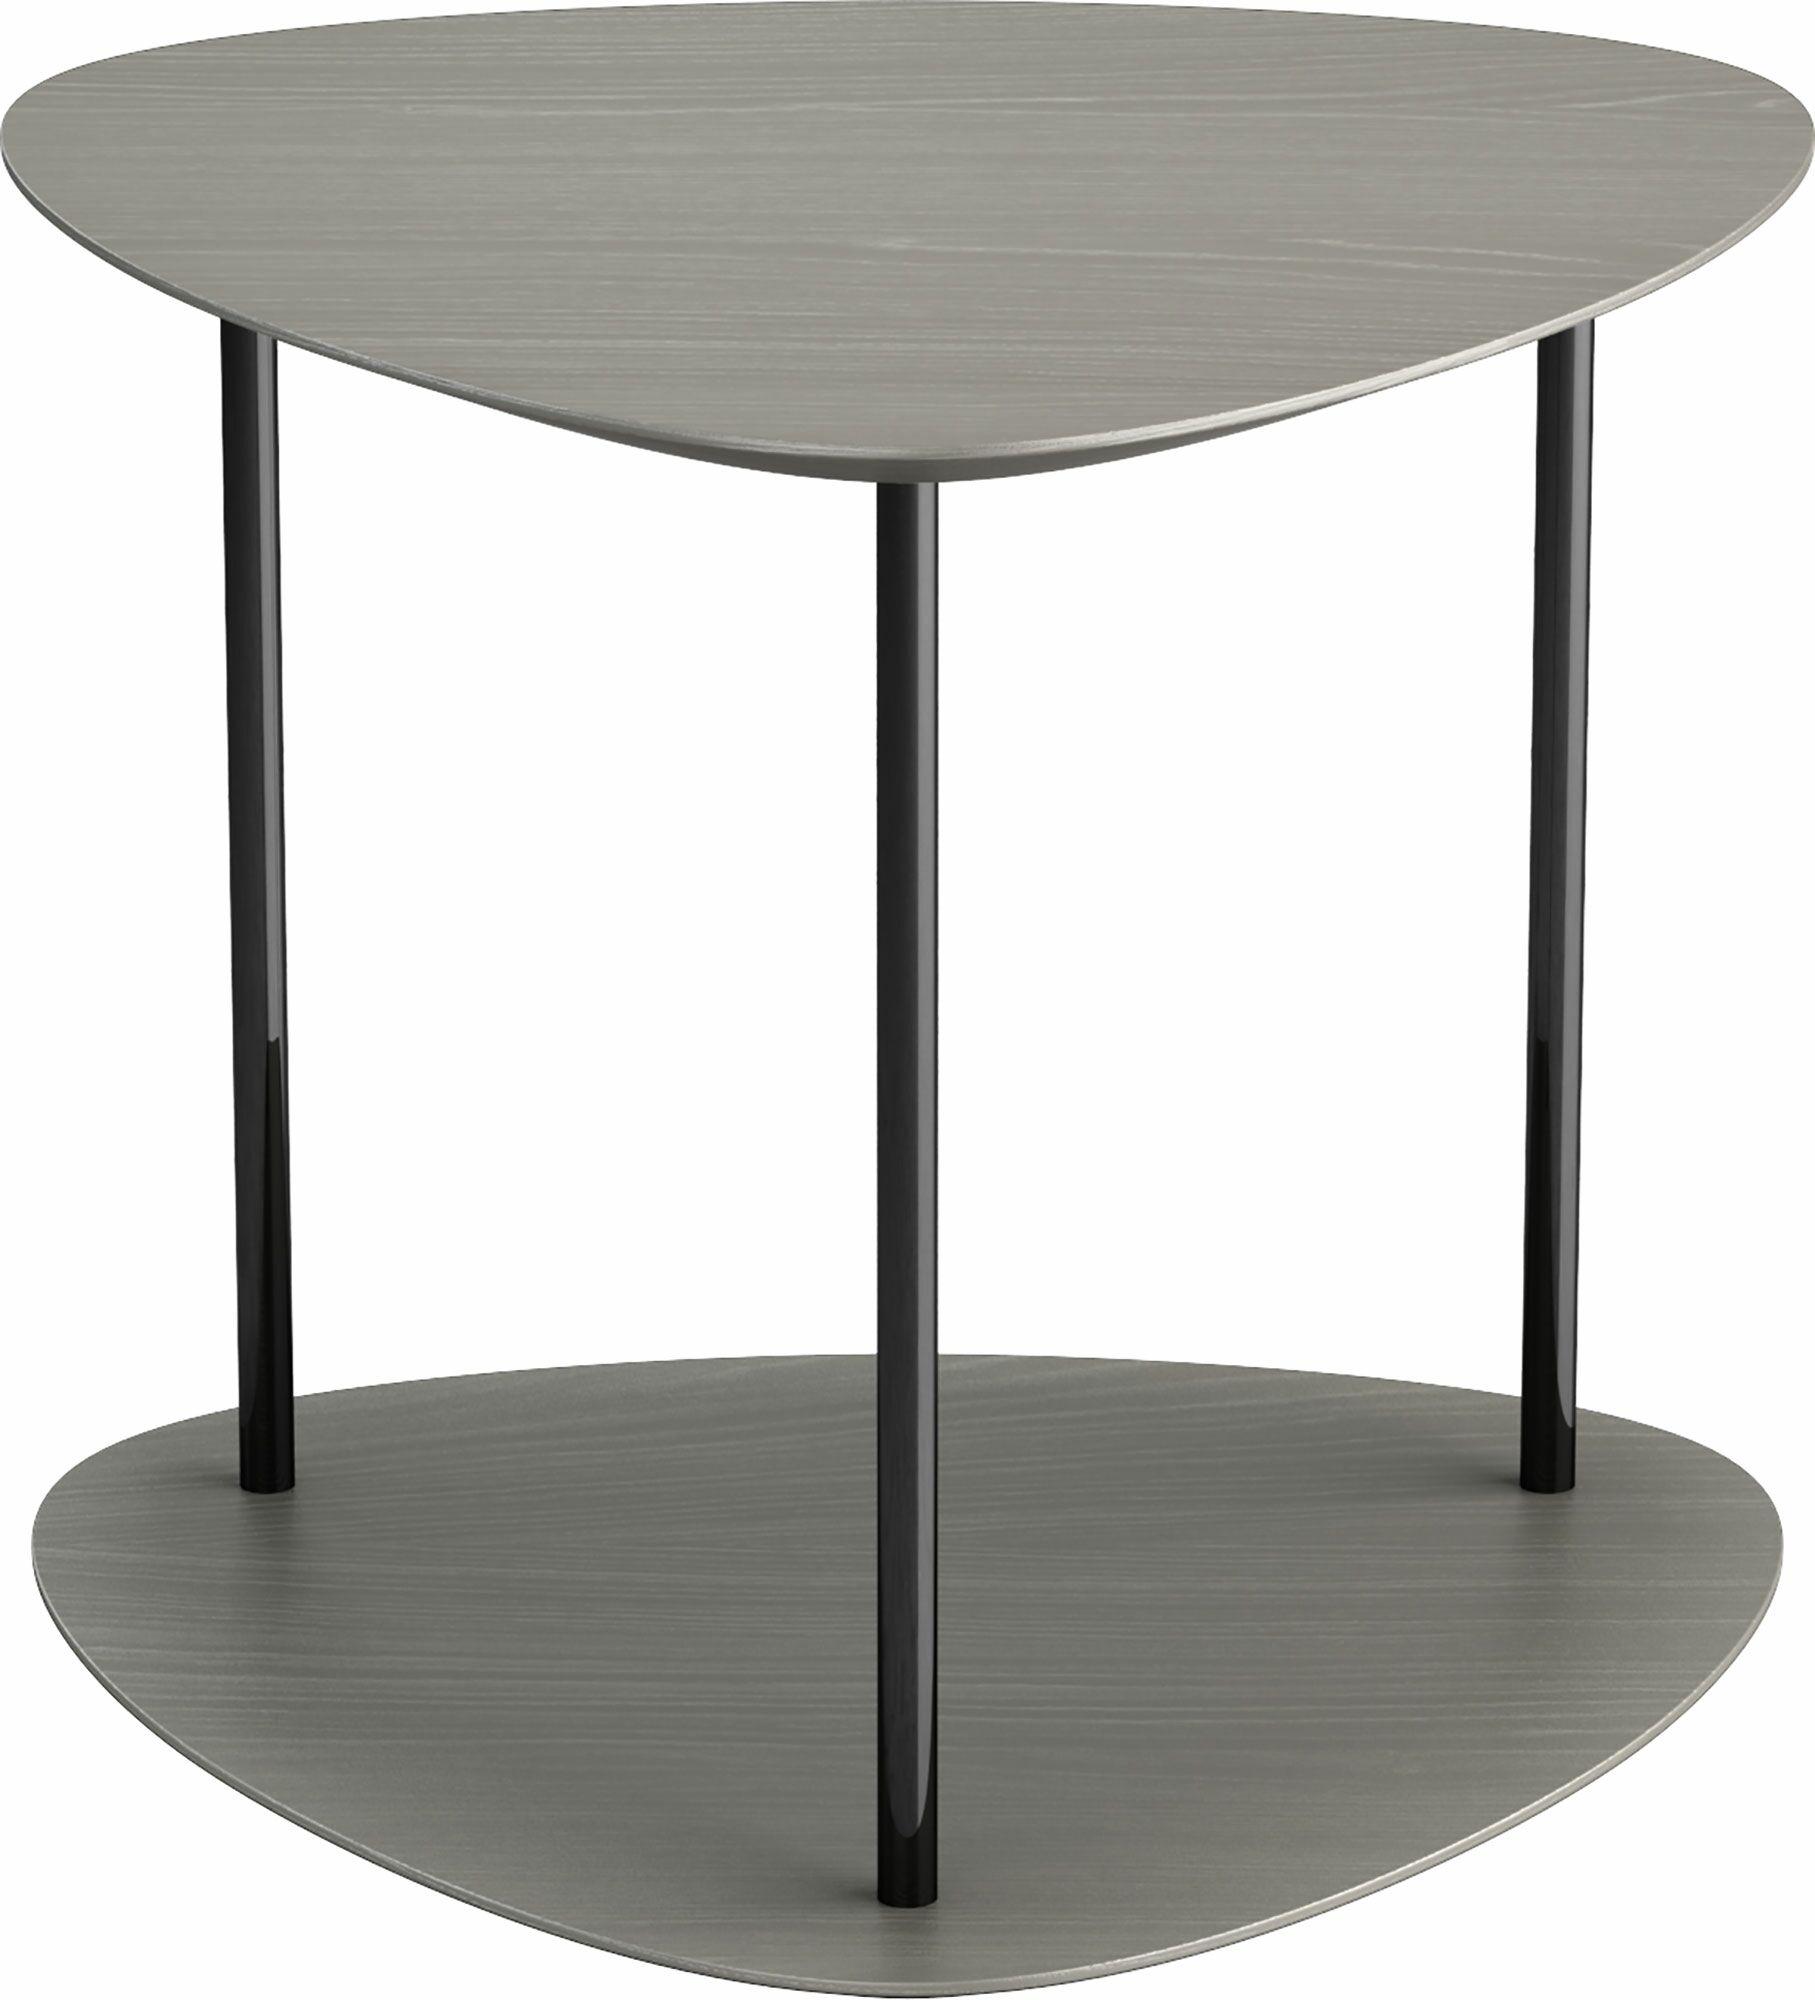 Finsbury End Table Color: Acier and Black Chrome